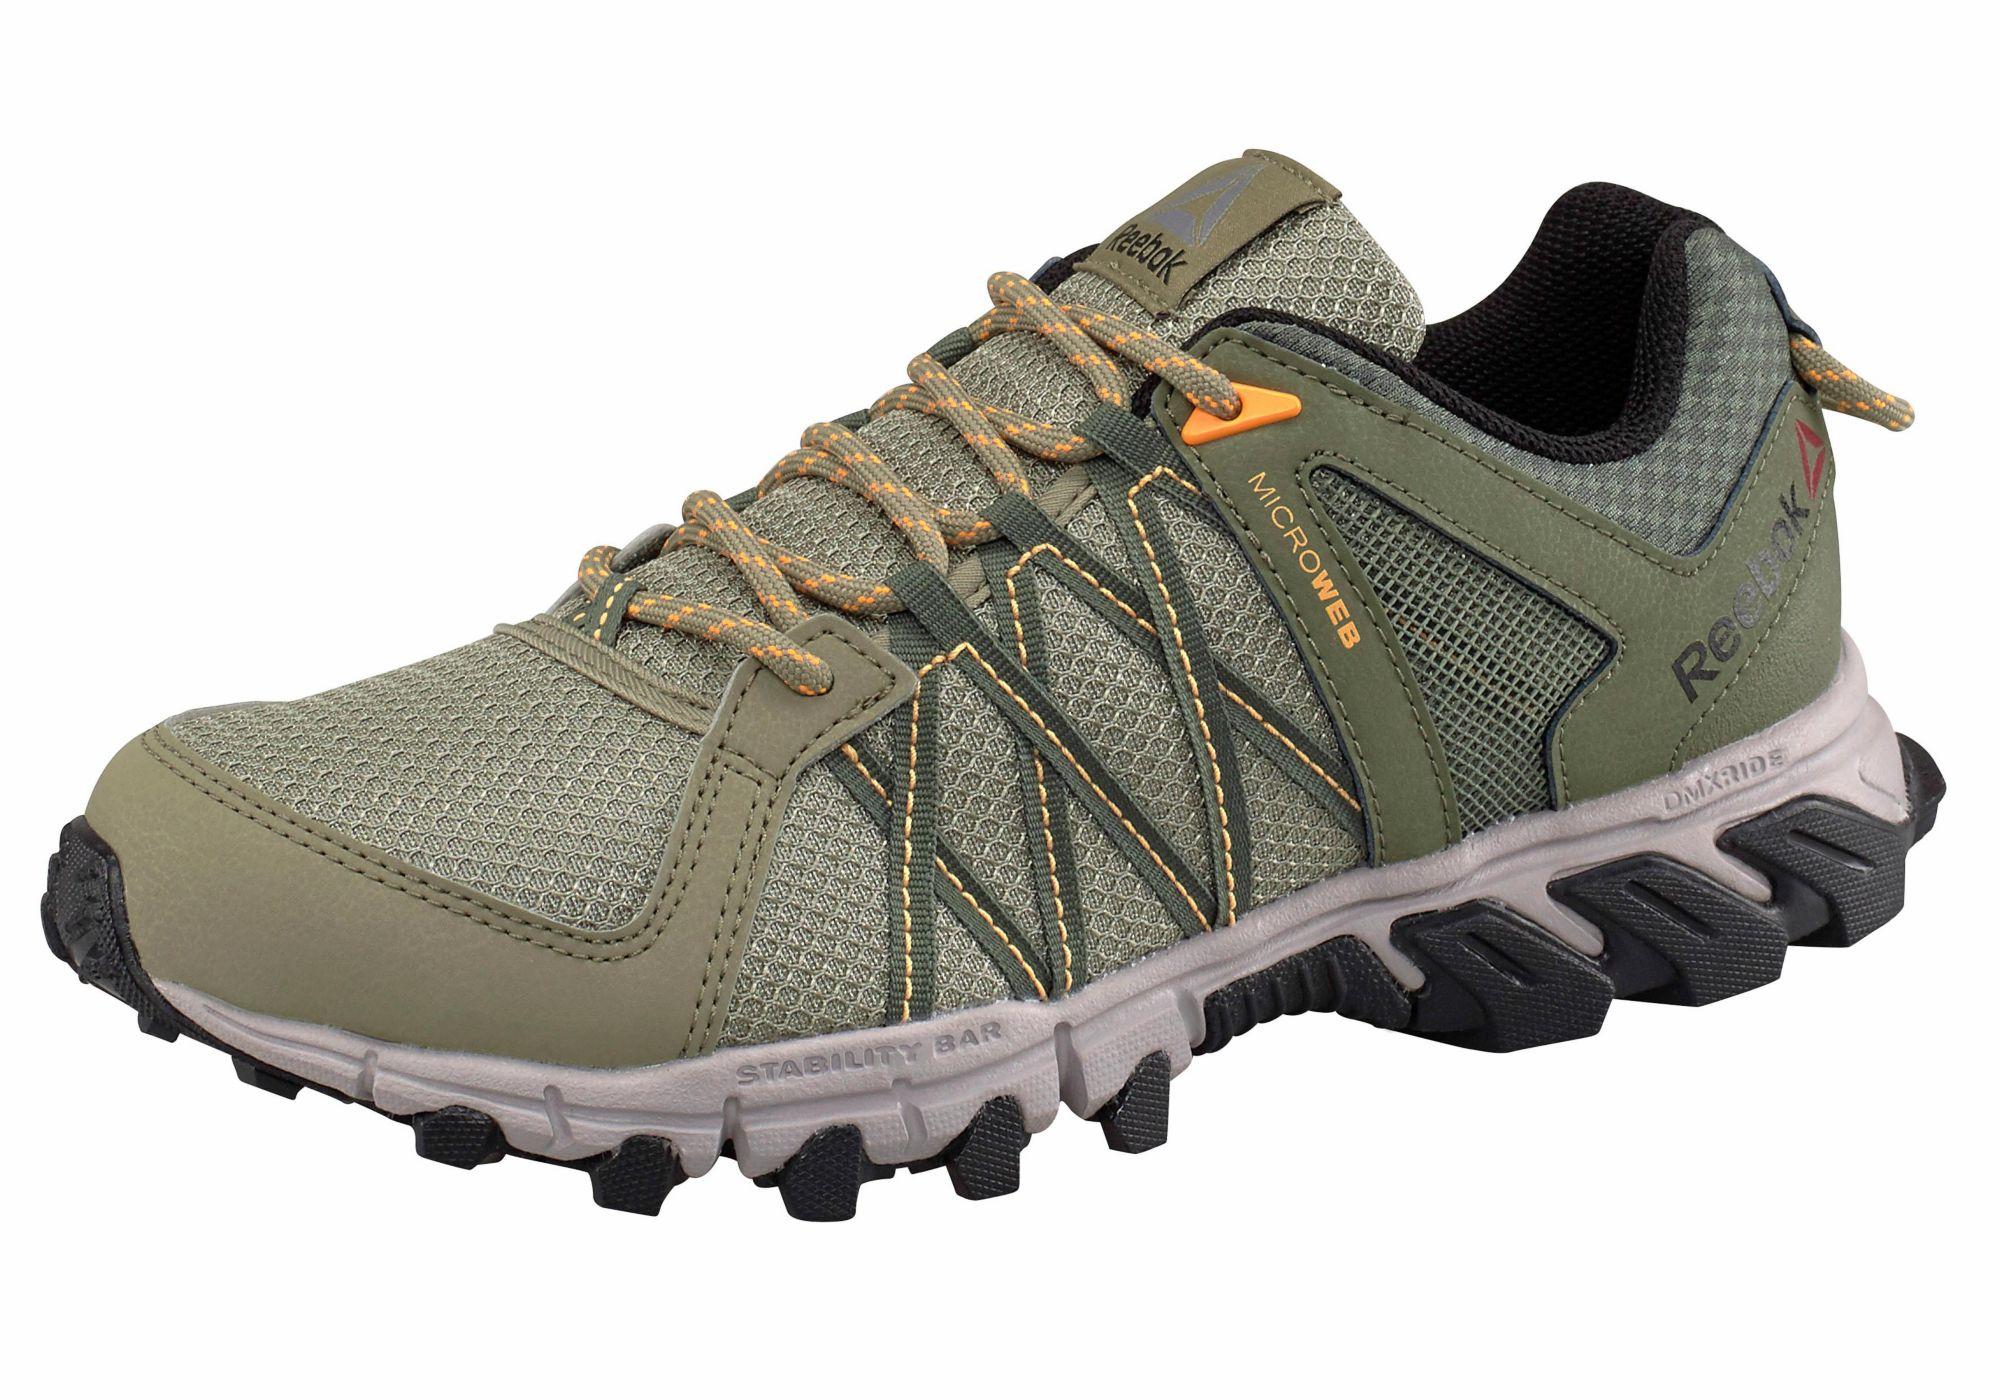 REEBOK Reebok Walkingschuh »Trail Grip RS 5.0«